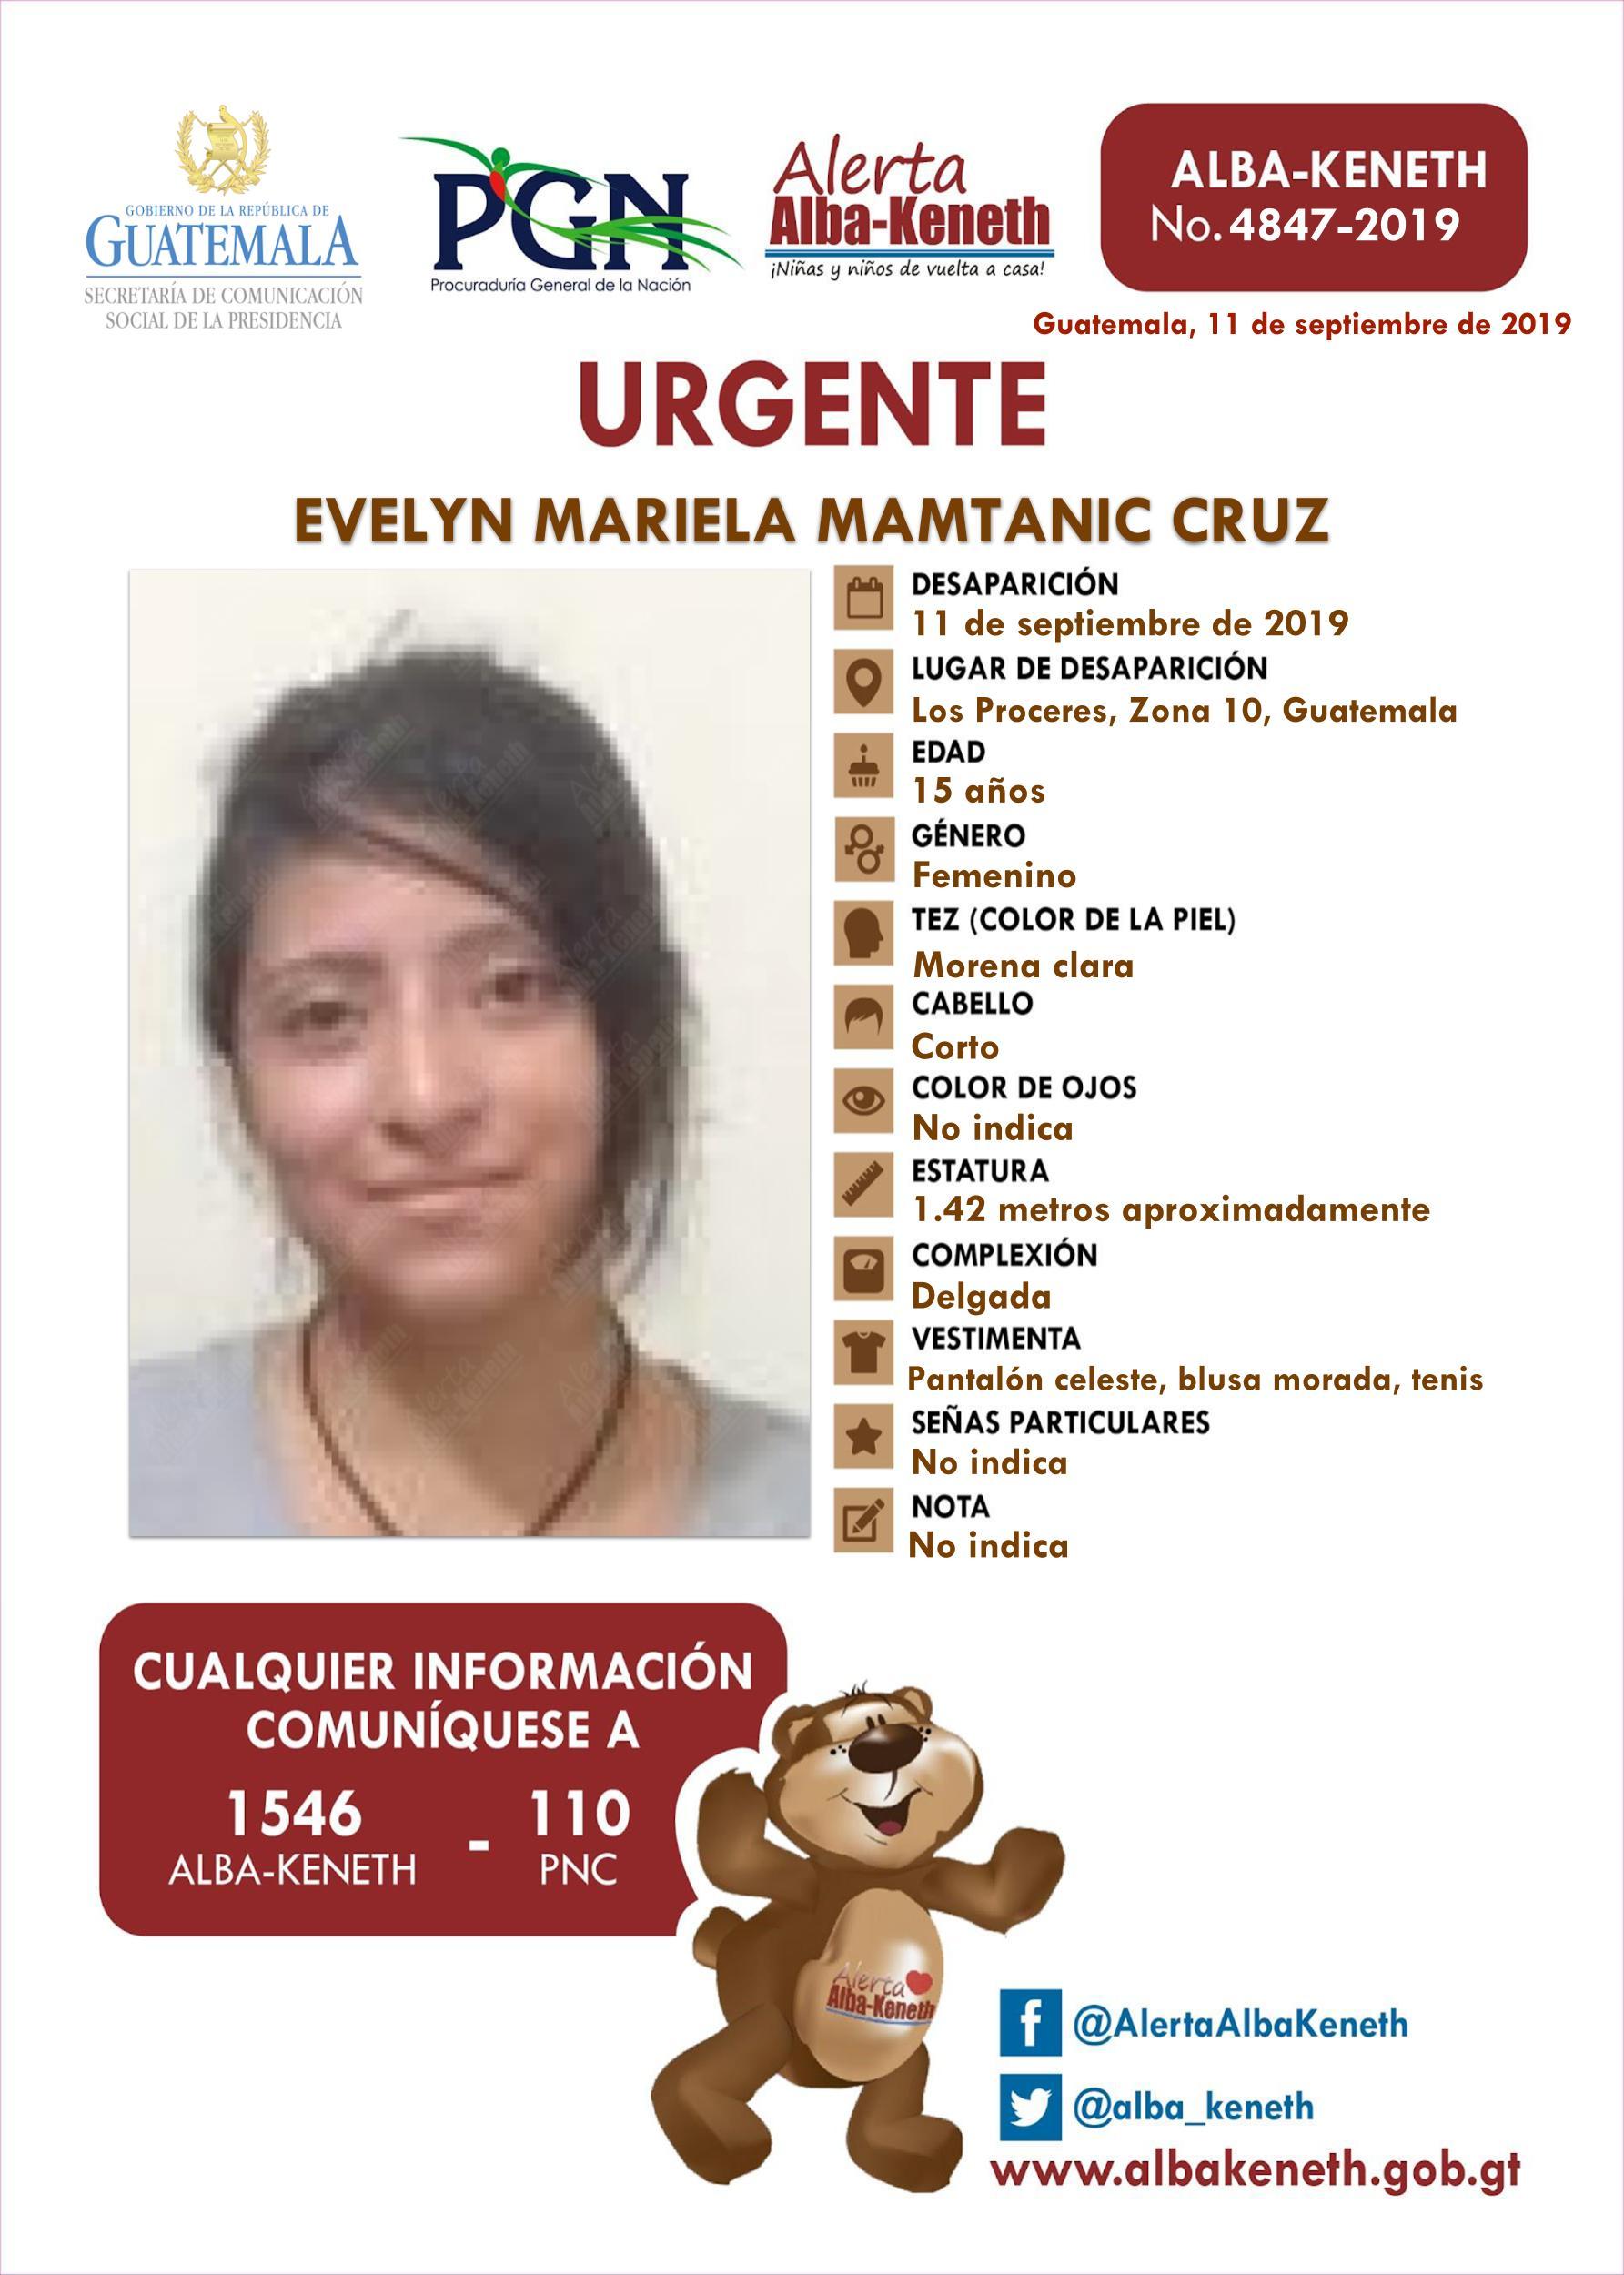 Evelyn Mariela Mamtanic Cruz